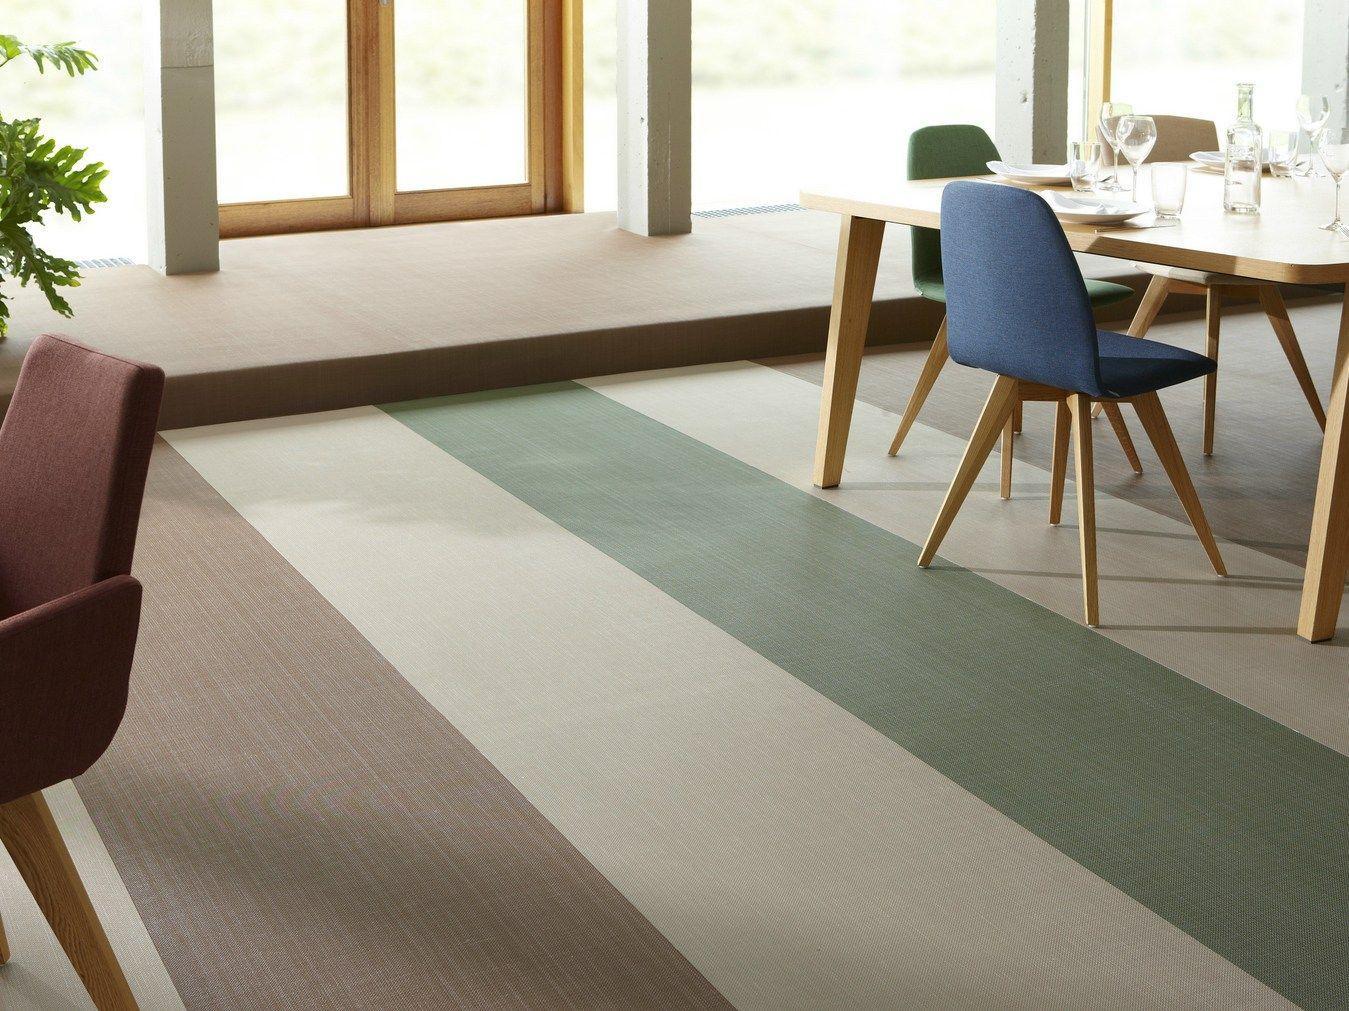 Pavimento de tejido vinilo be easy by dickson - Pavimentos de vinilo ...